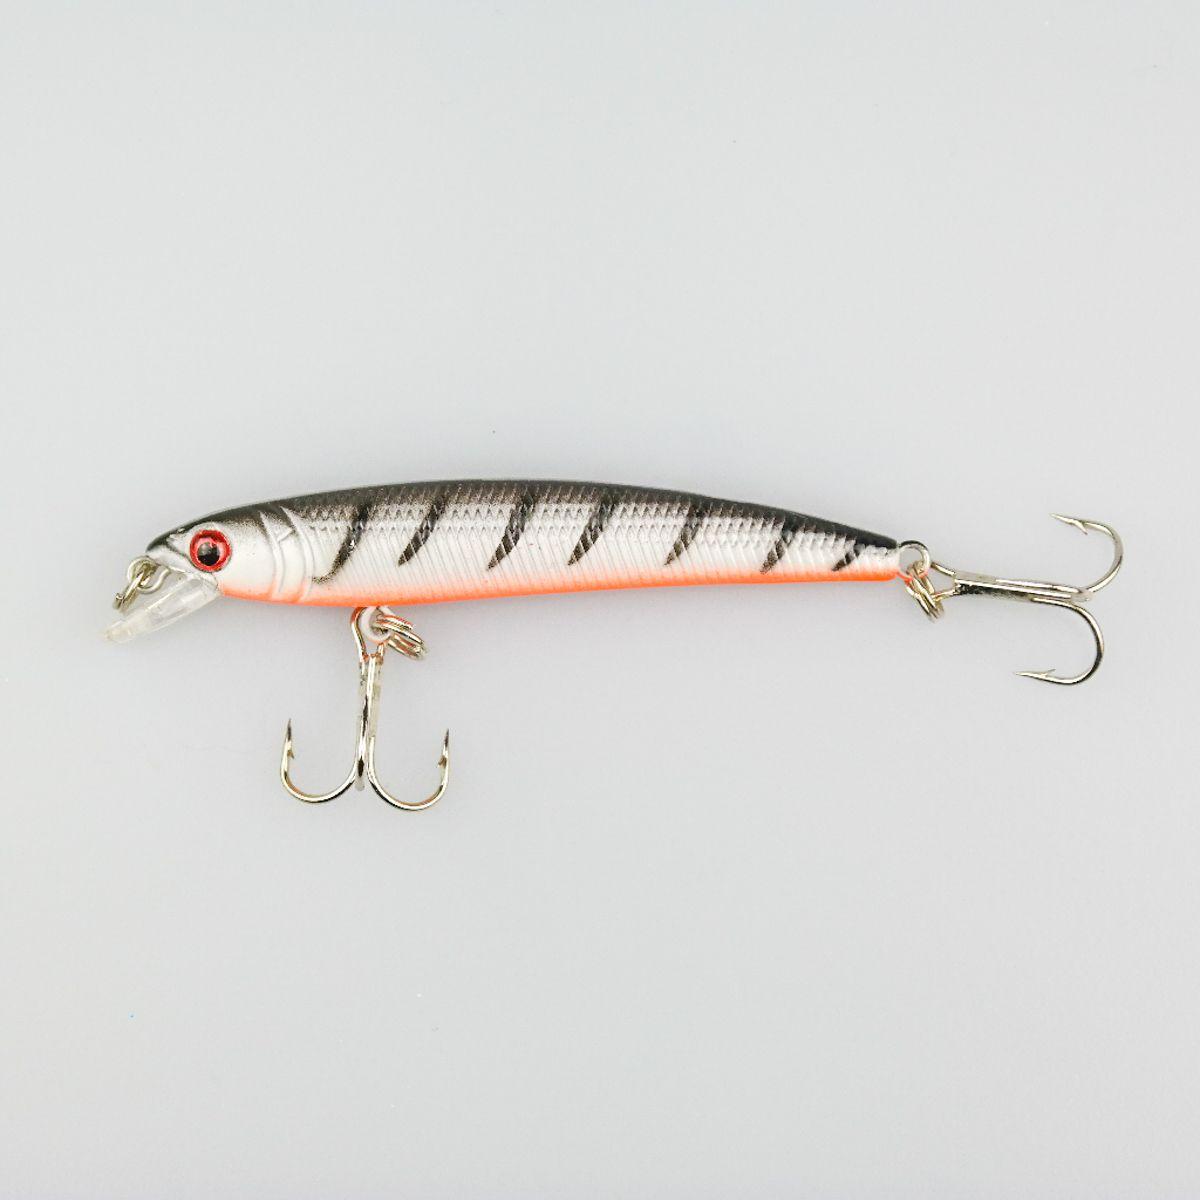 Fishing Lure Hard Bait MI007 Length 9.8CM Weight 5G High-Carbon Hook Plastic Artificial Vivid Swimming Hard Bait